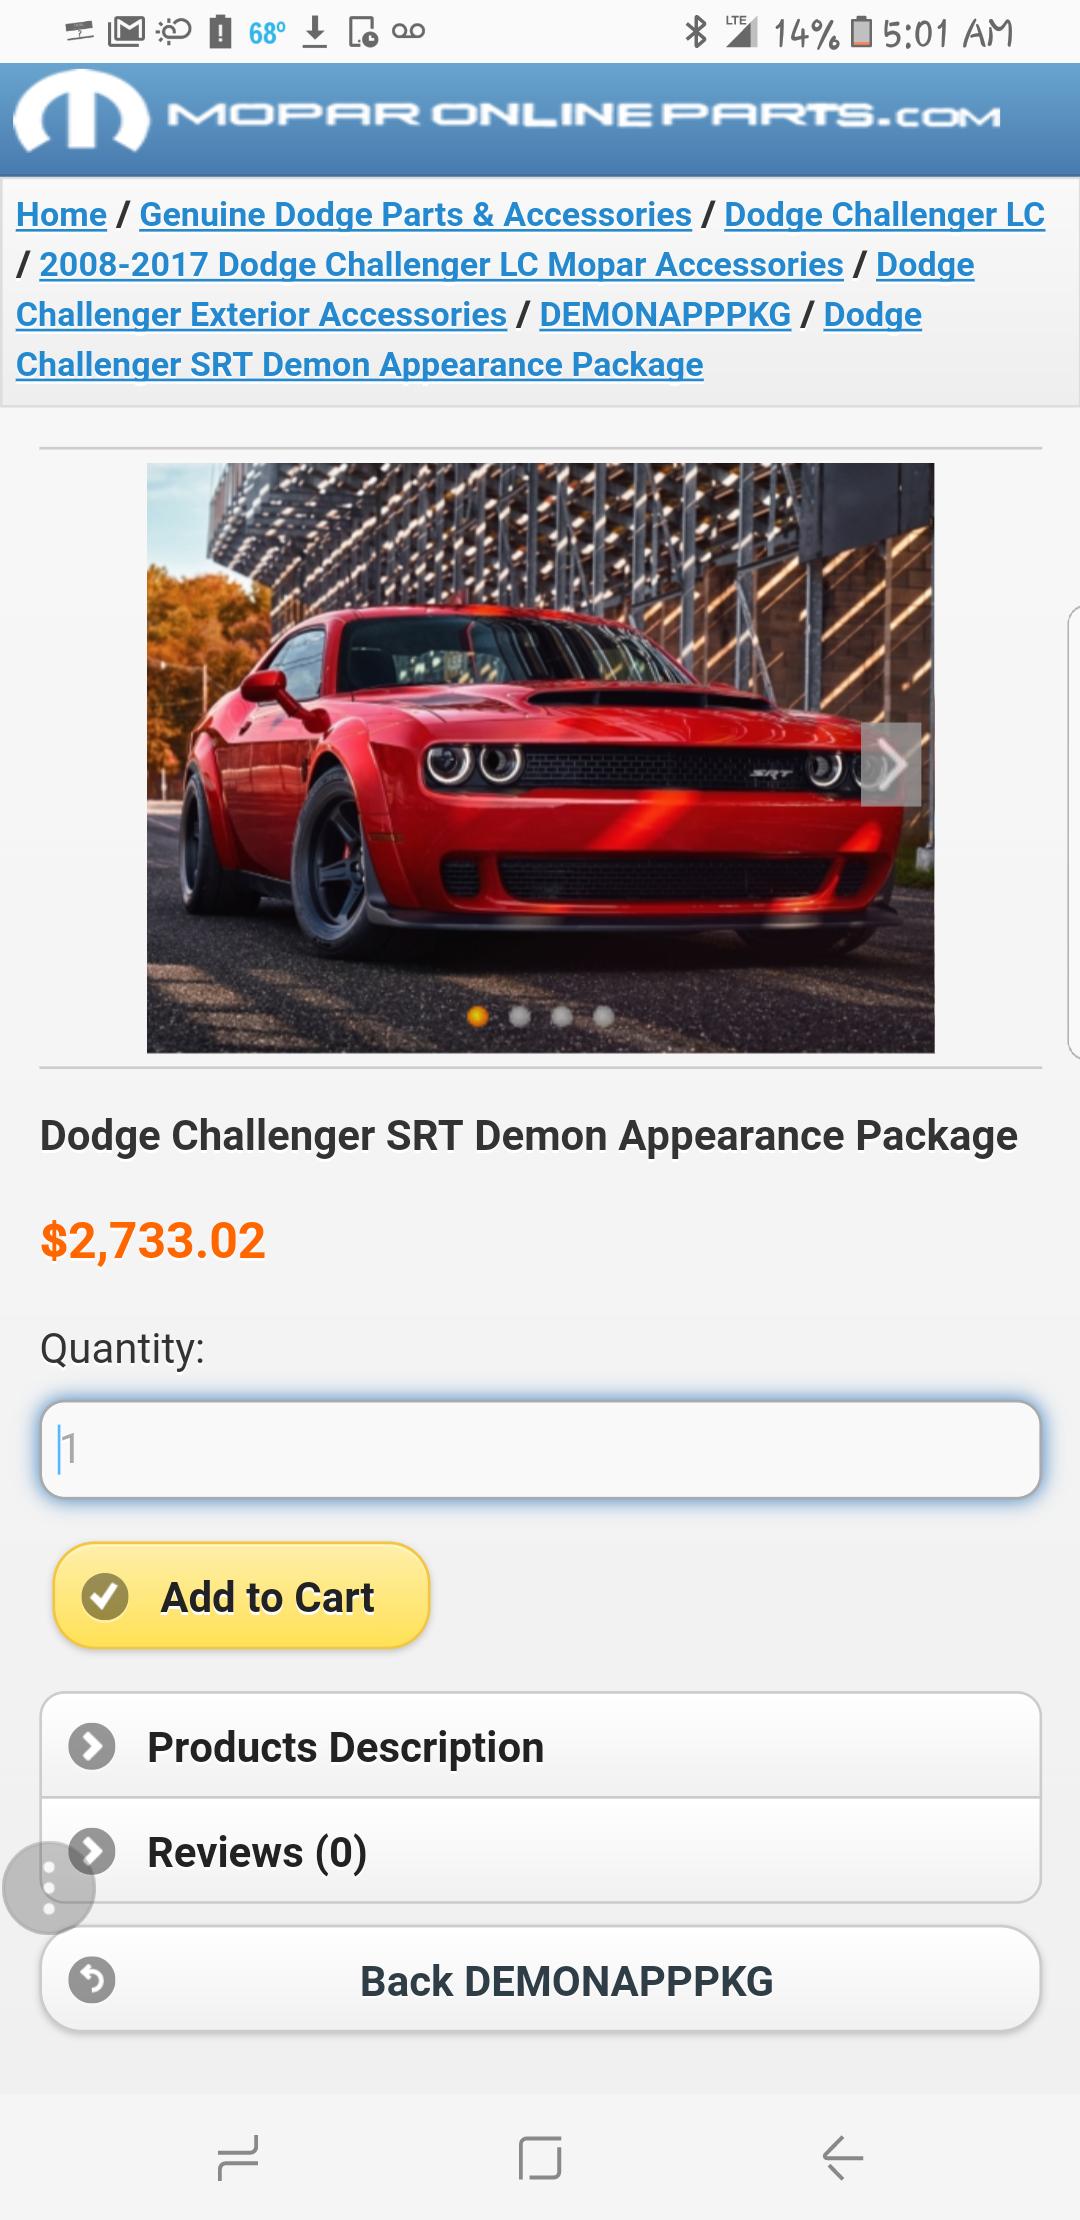 Srt Demon Appearance Package 2733 02 Srt Hellcat Forum